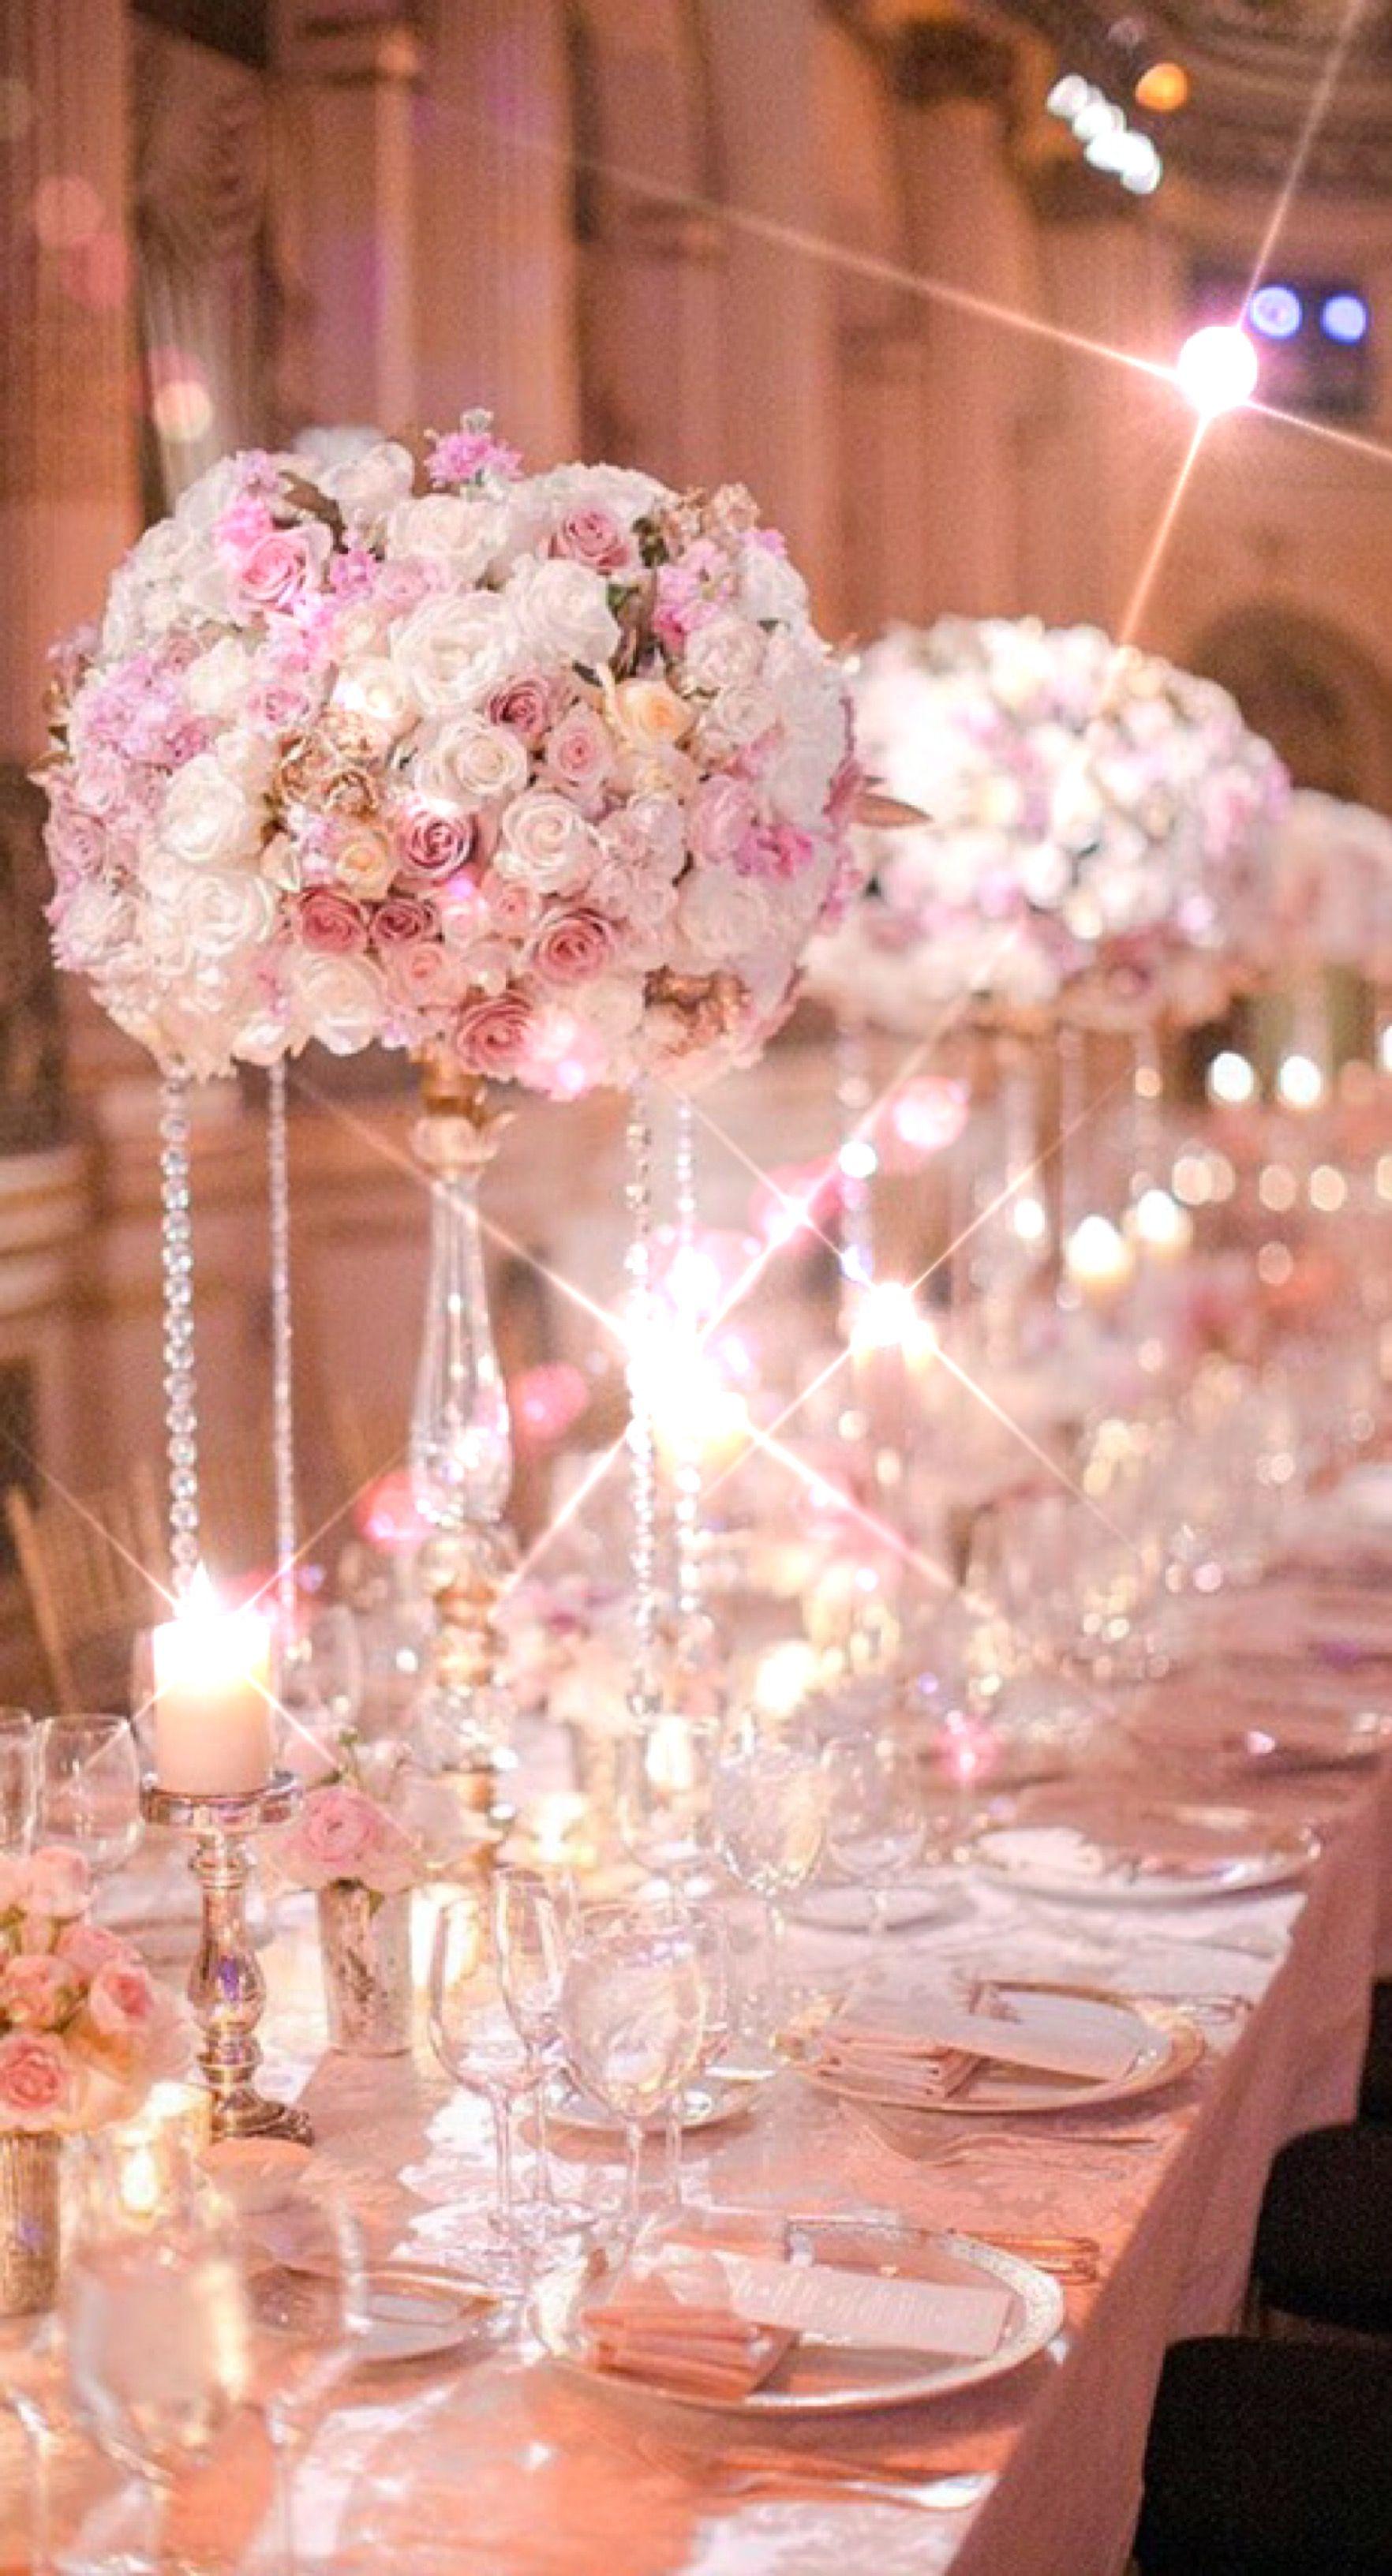 Steal-Worthy Wedding Flower Ideas | Pinterest | Light wedding ...